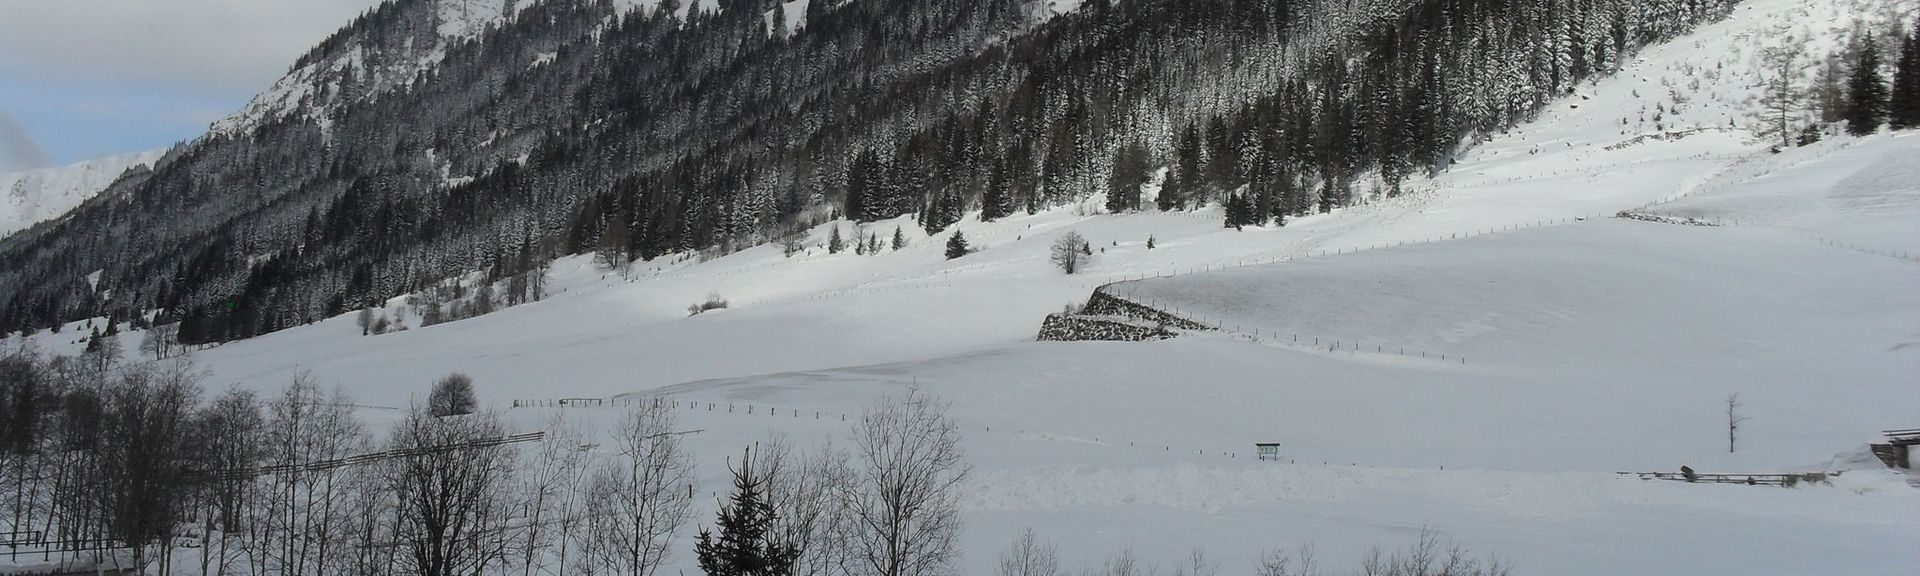 Triebenin asema, Trieben, Steiermark, Itävalta